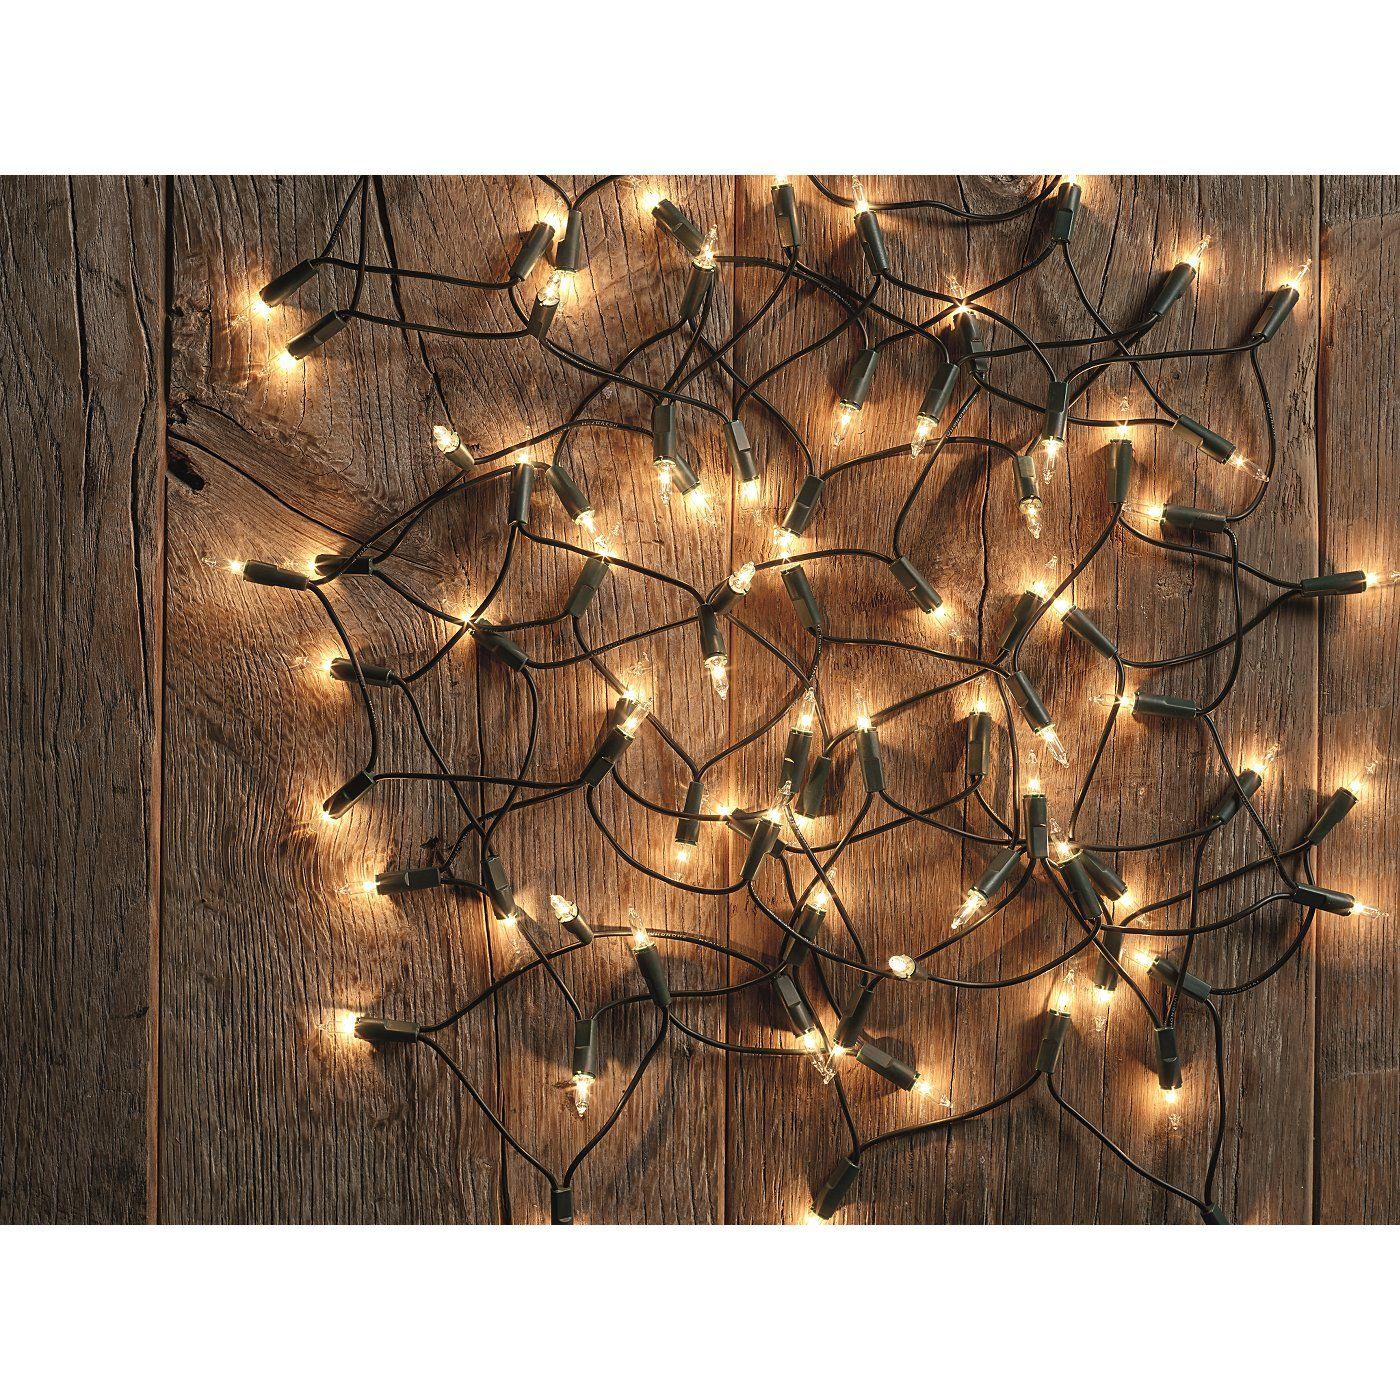 80 Fairy Lights Tree Decorations ASDA direct Fairy